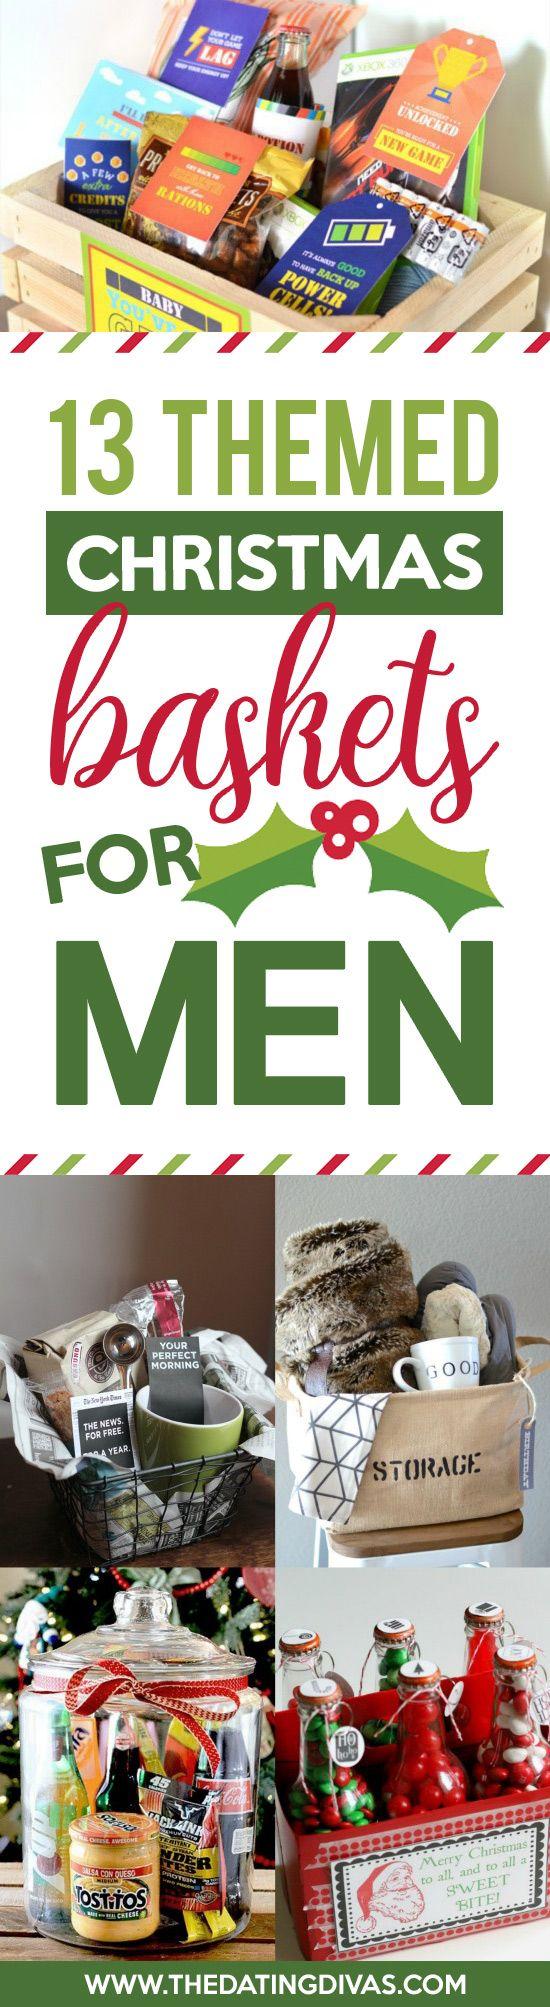 Christmas Gift Baskets for Men                                                                                                                                                                                 More